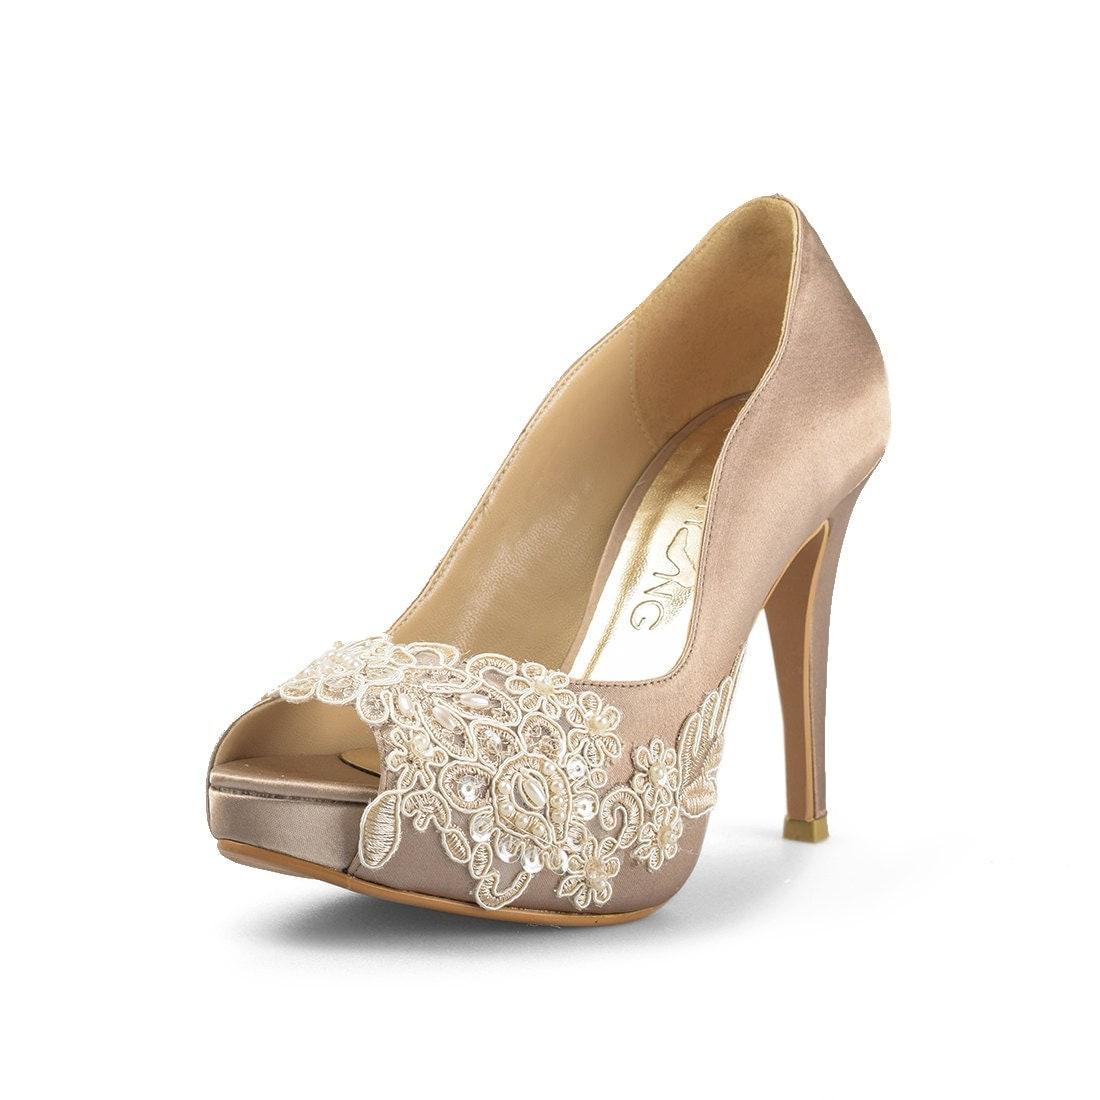 Miss ace 2 dark champagne wedding heels taupe satin bridal for Heels for wedding dress